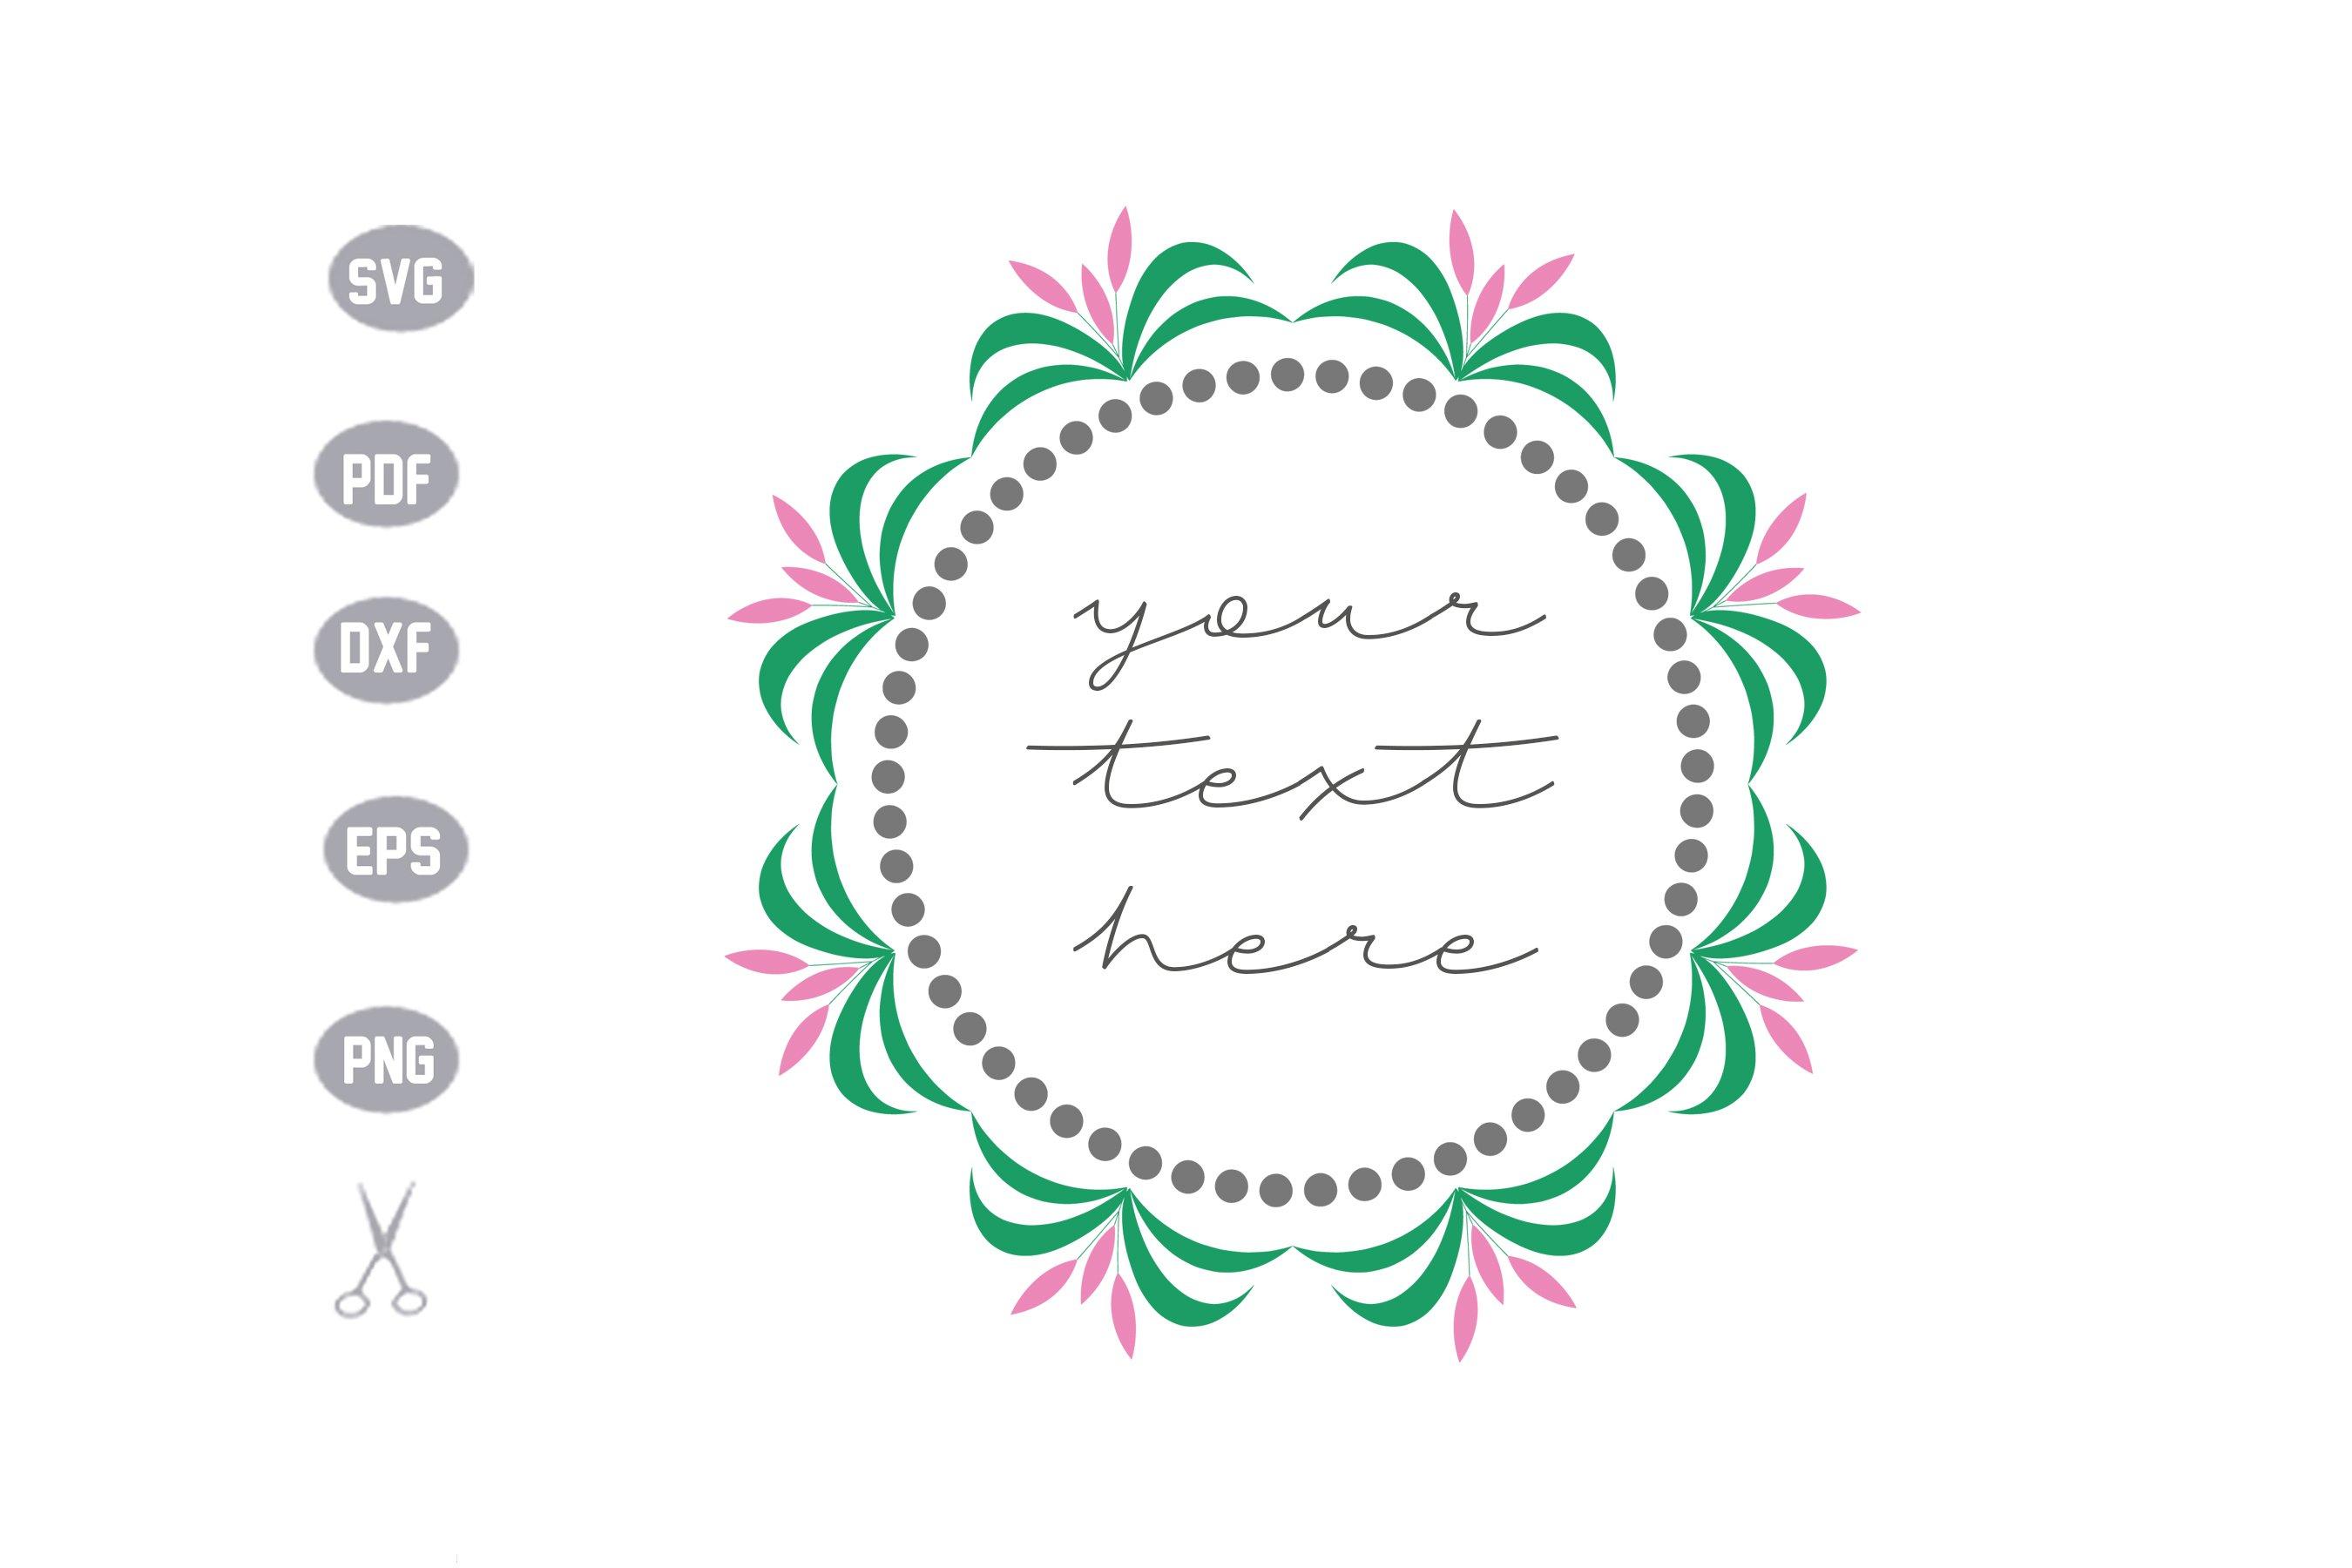 Flower Frame Monogram SVG example image 1